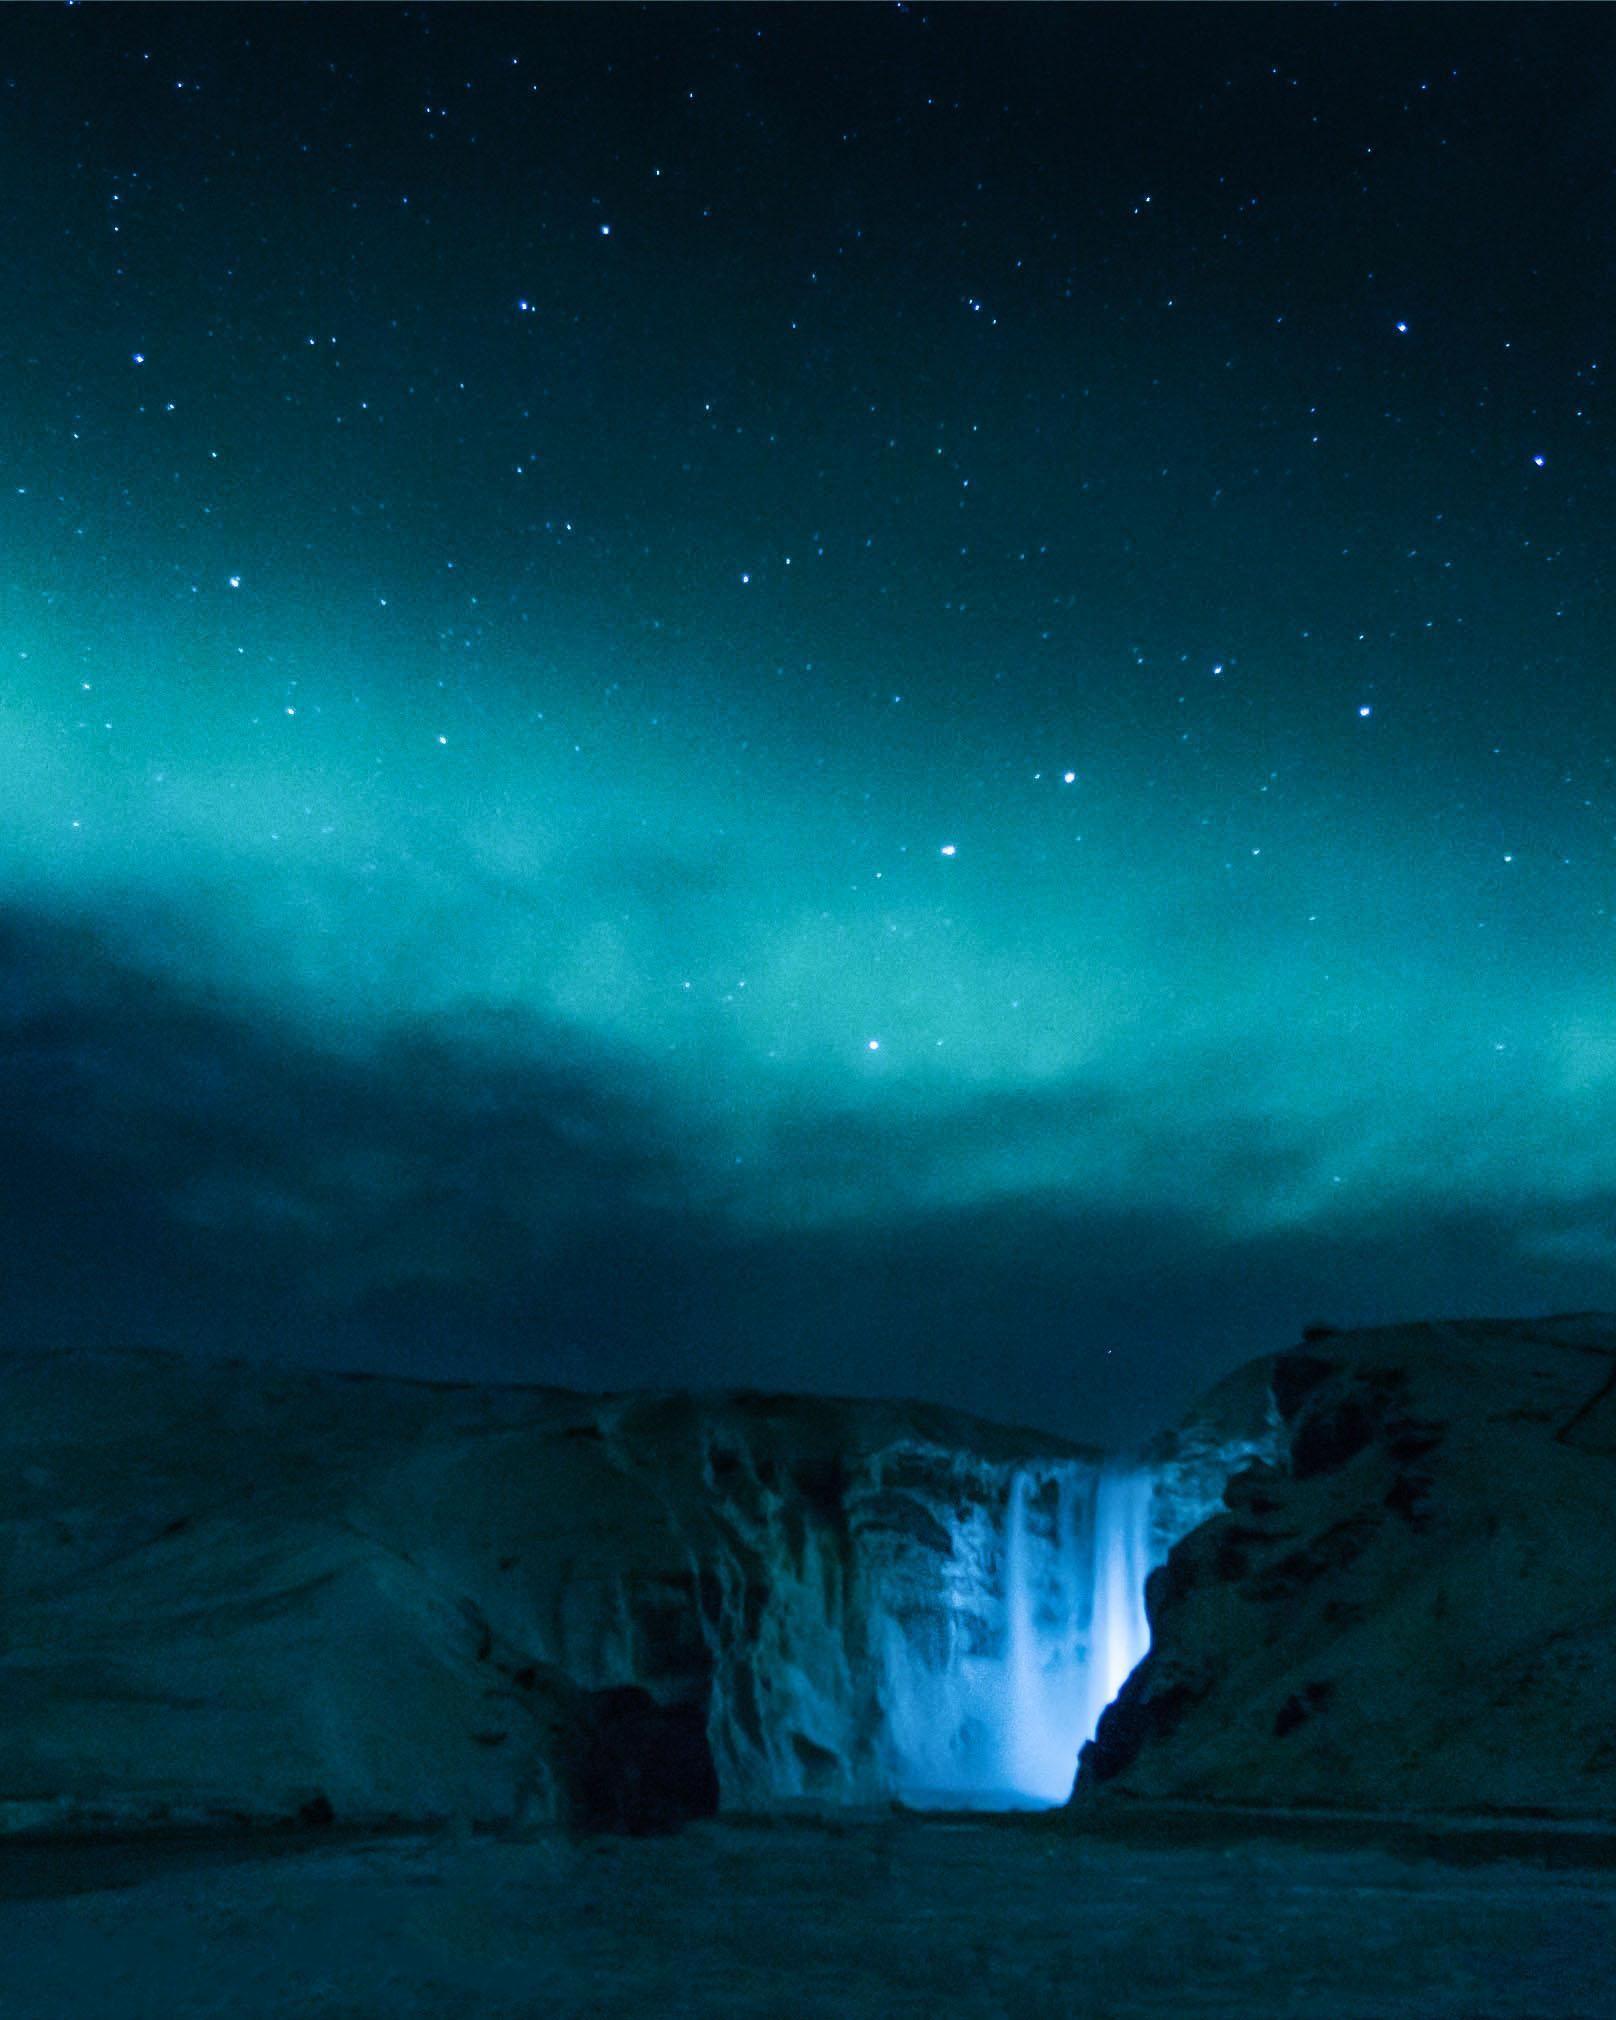 Locations Unknown In 2020 Beautiful Night Sky Night Scenery Night Sky Photography